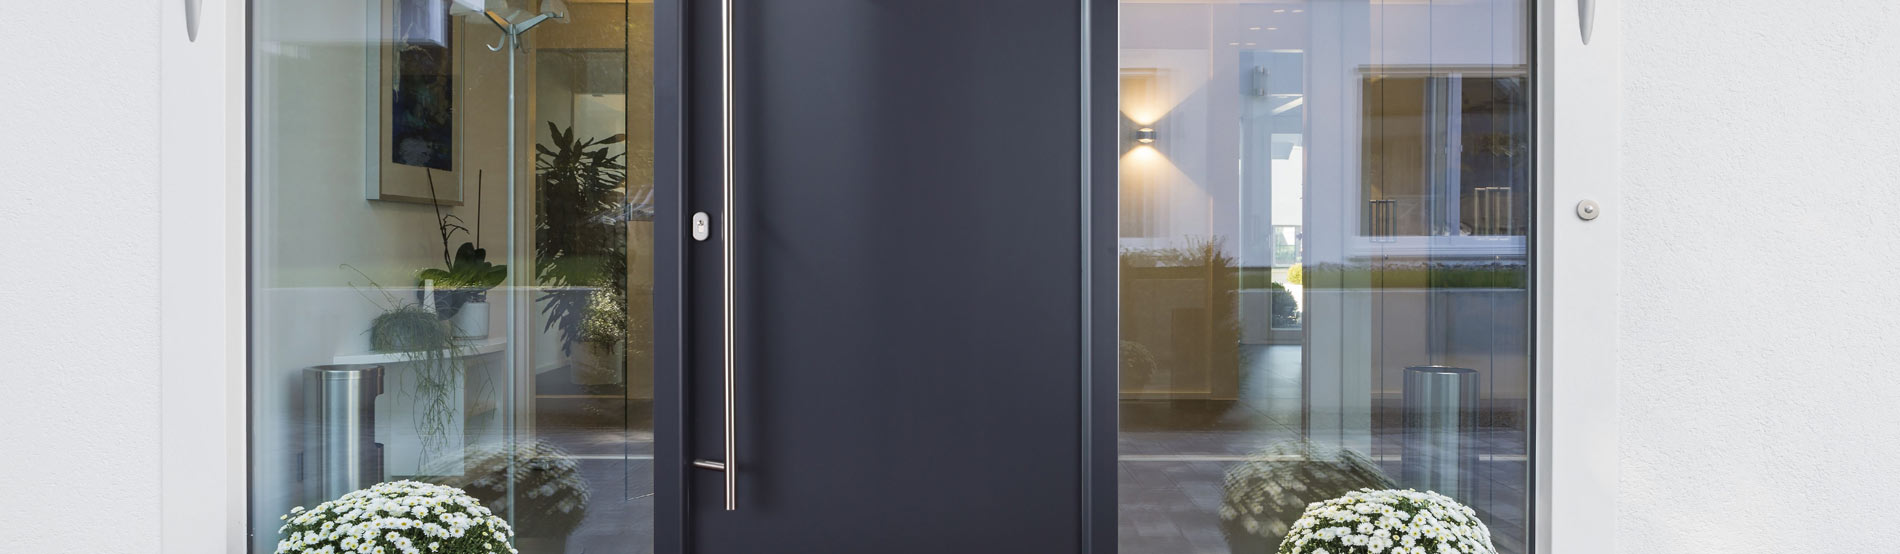 Hochwertige Aluminium Haustüren